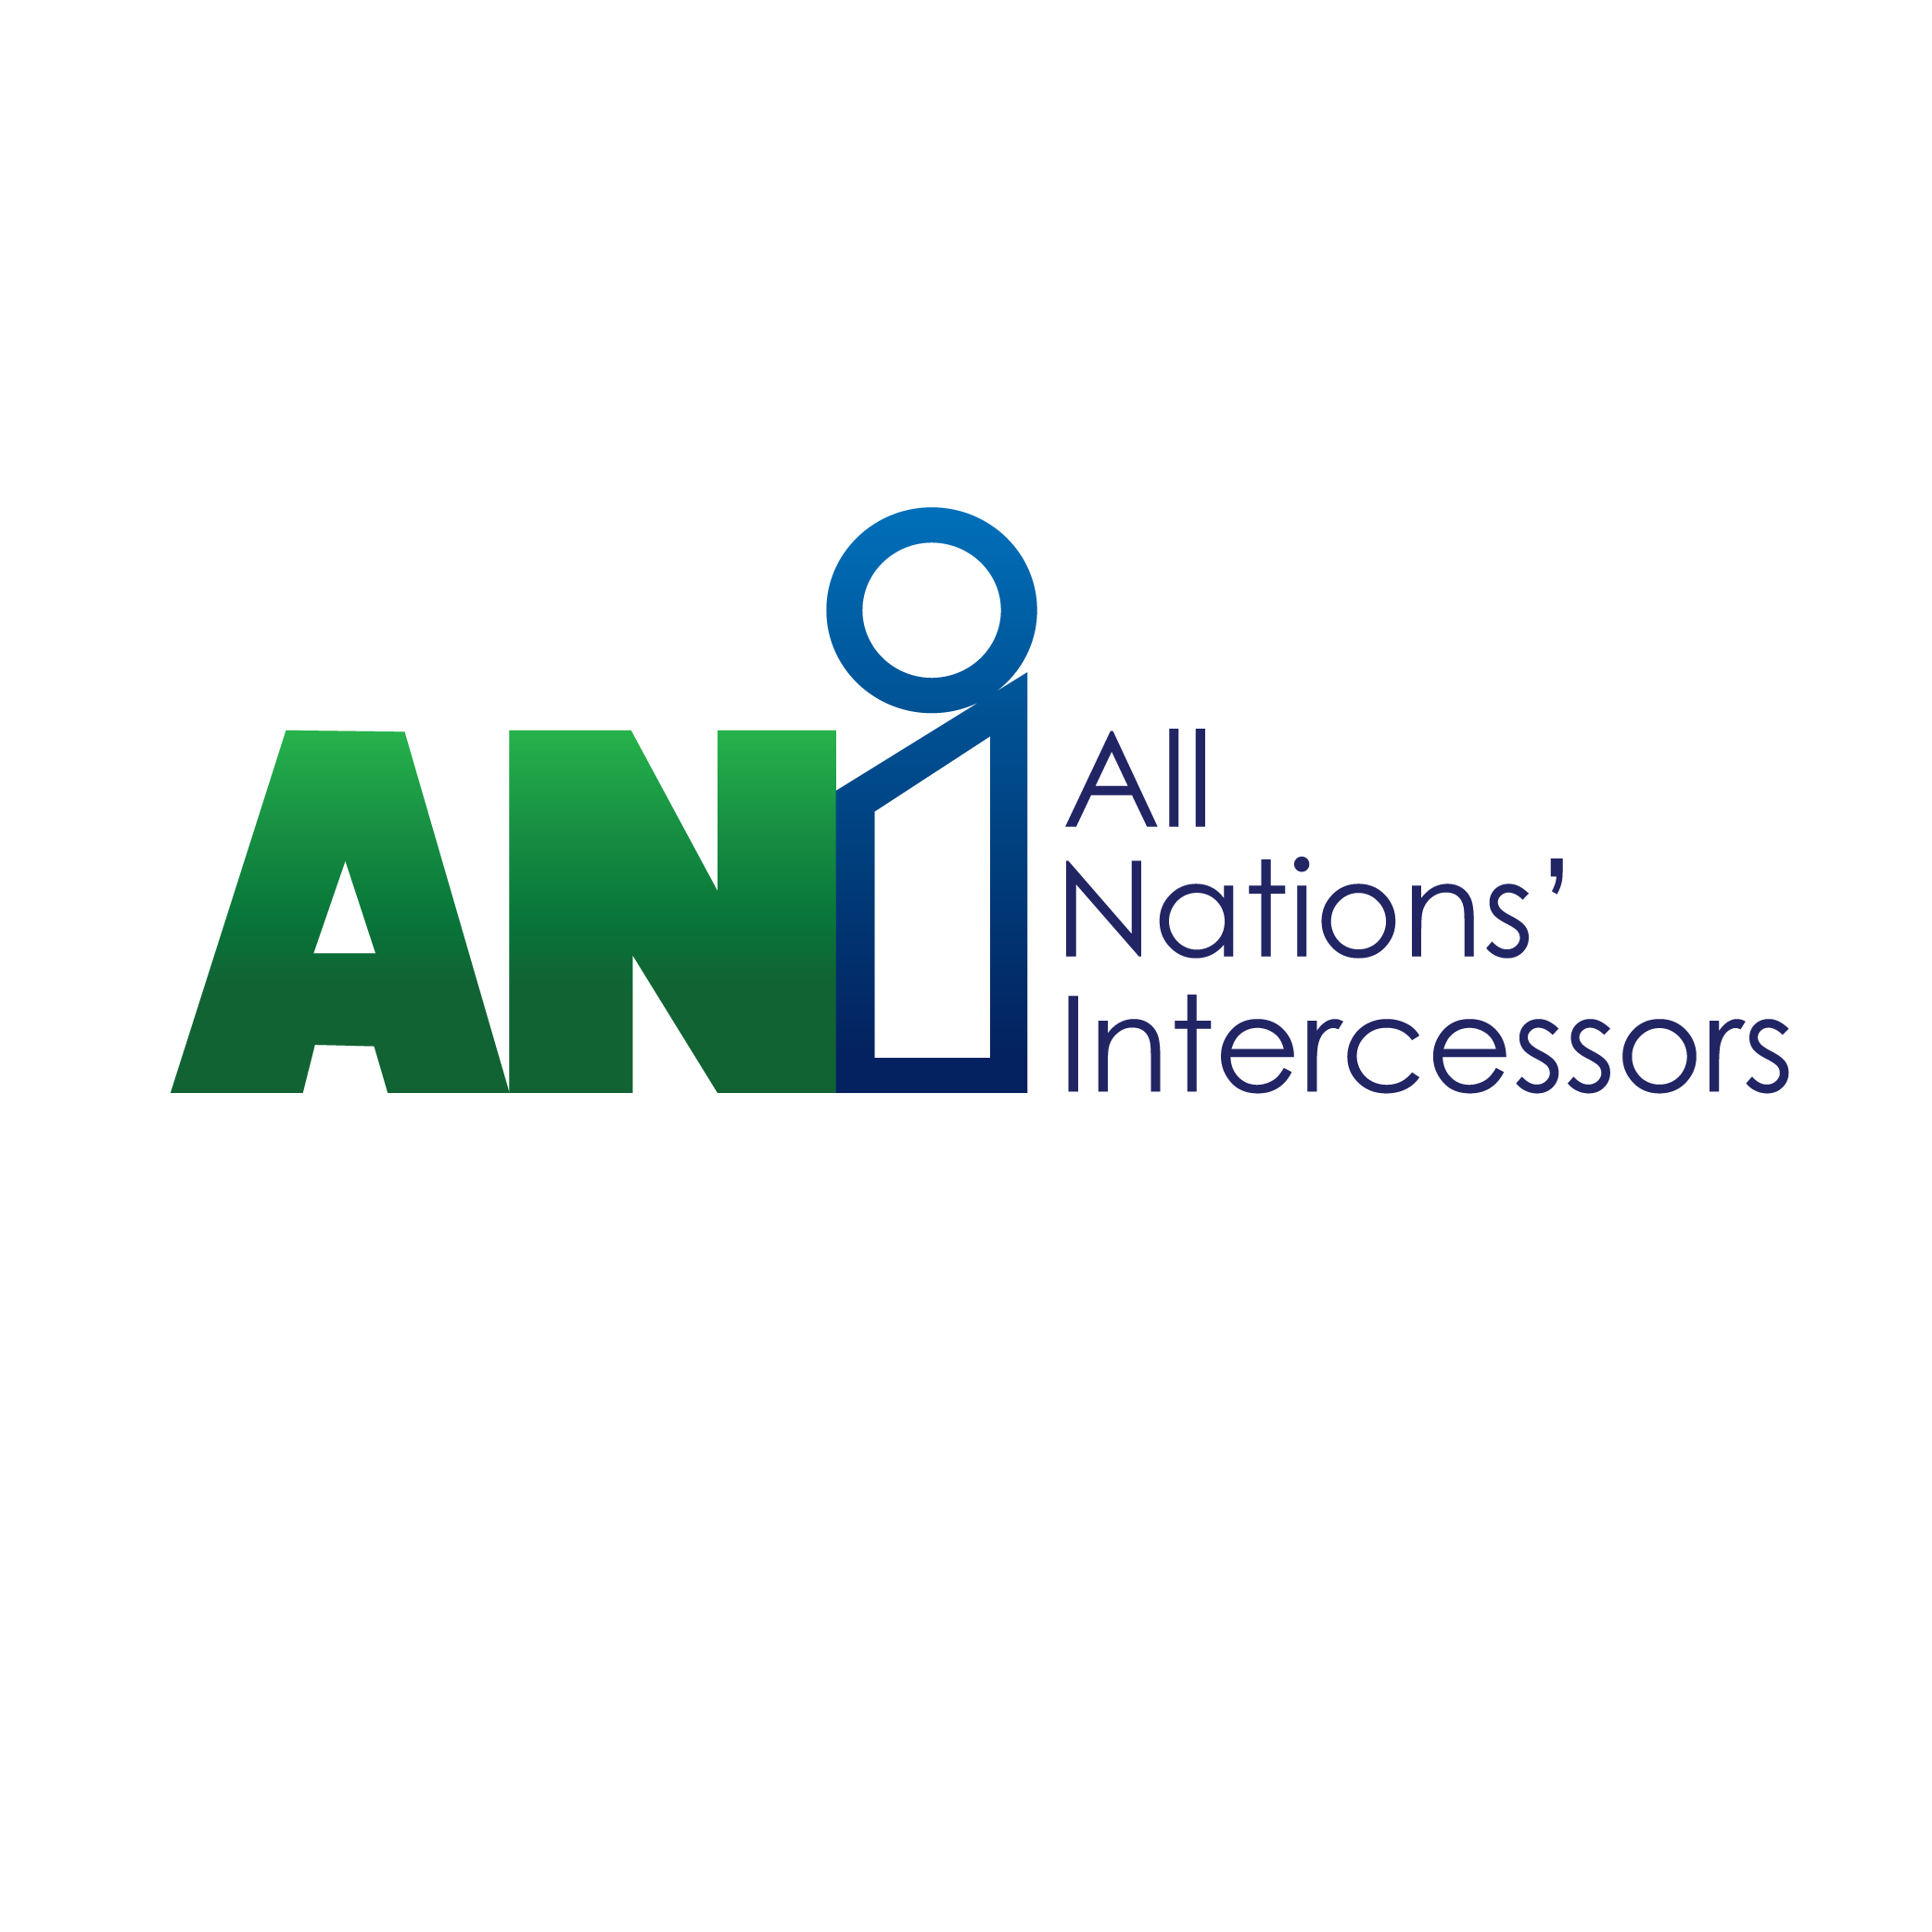 All Nations' Intercessors